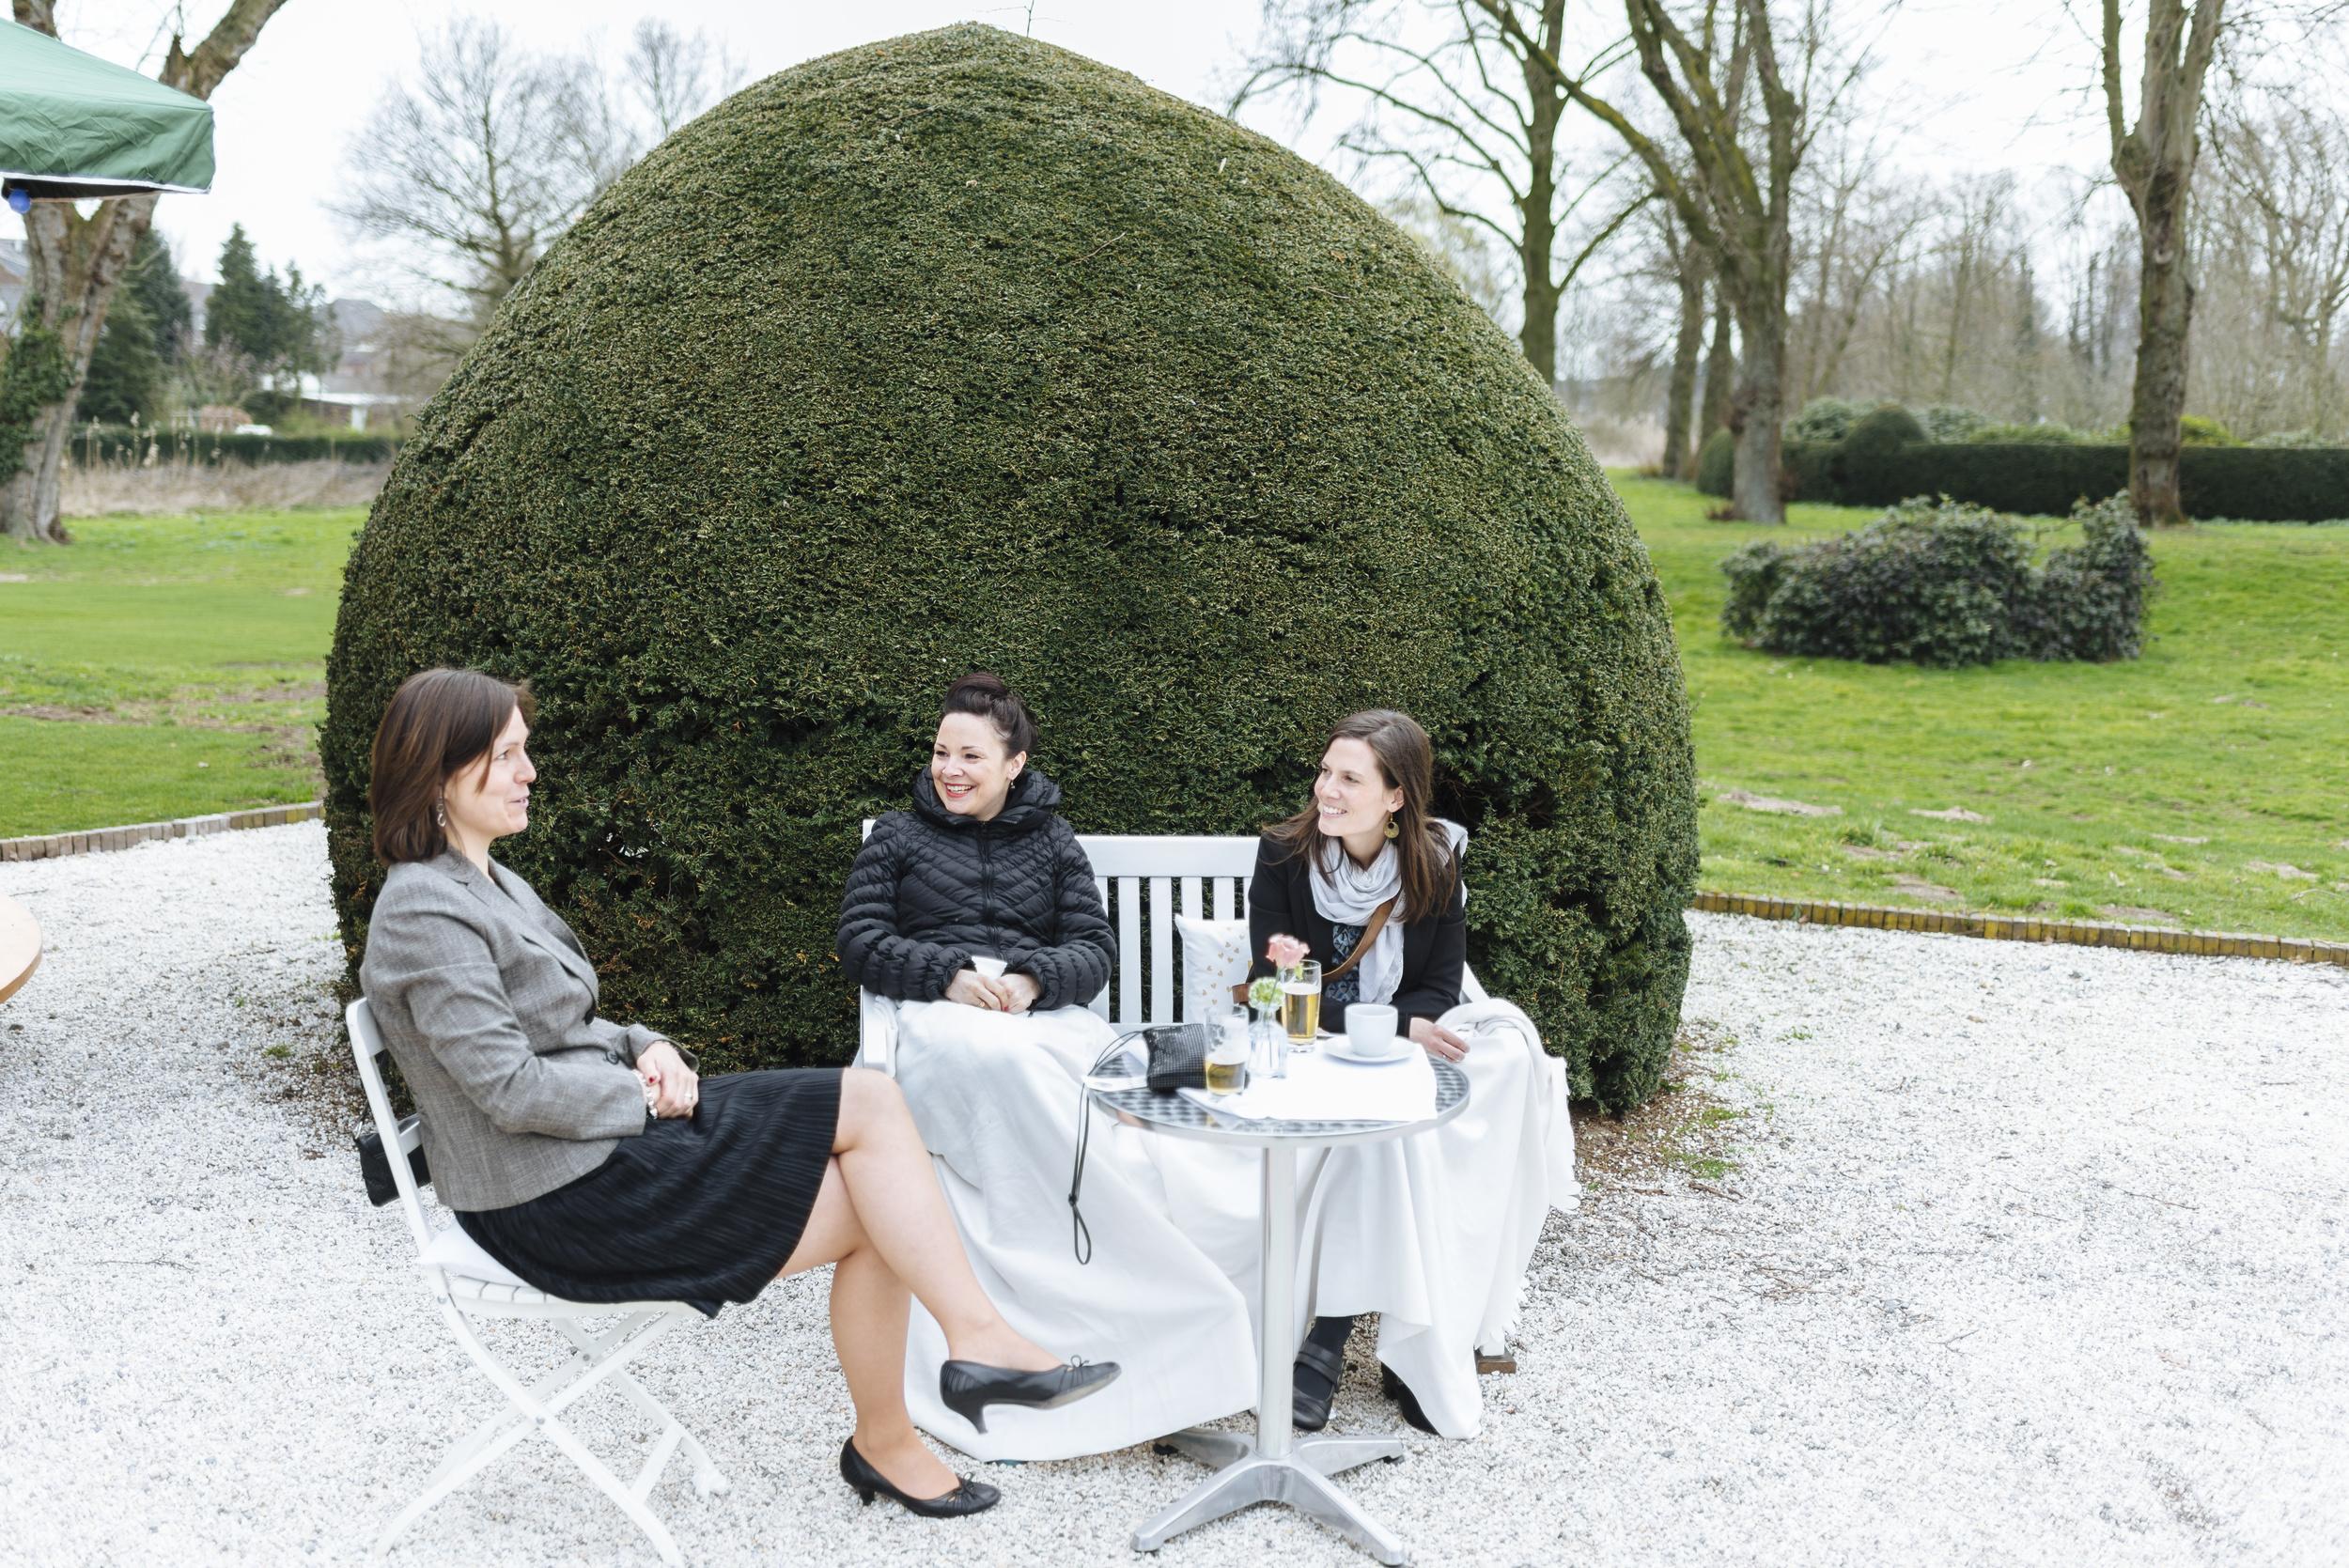 Hochzeitsfotograf-Schlossruine-Hertefeld-Weeze-126.jpg